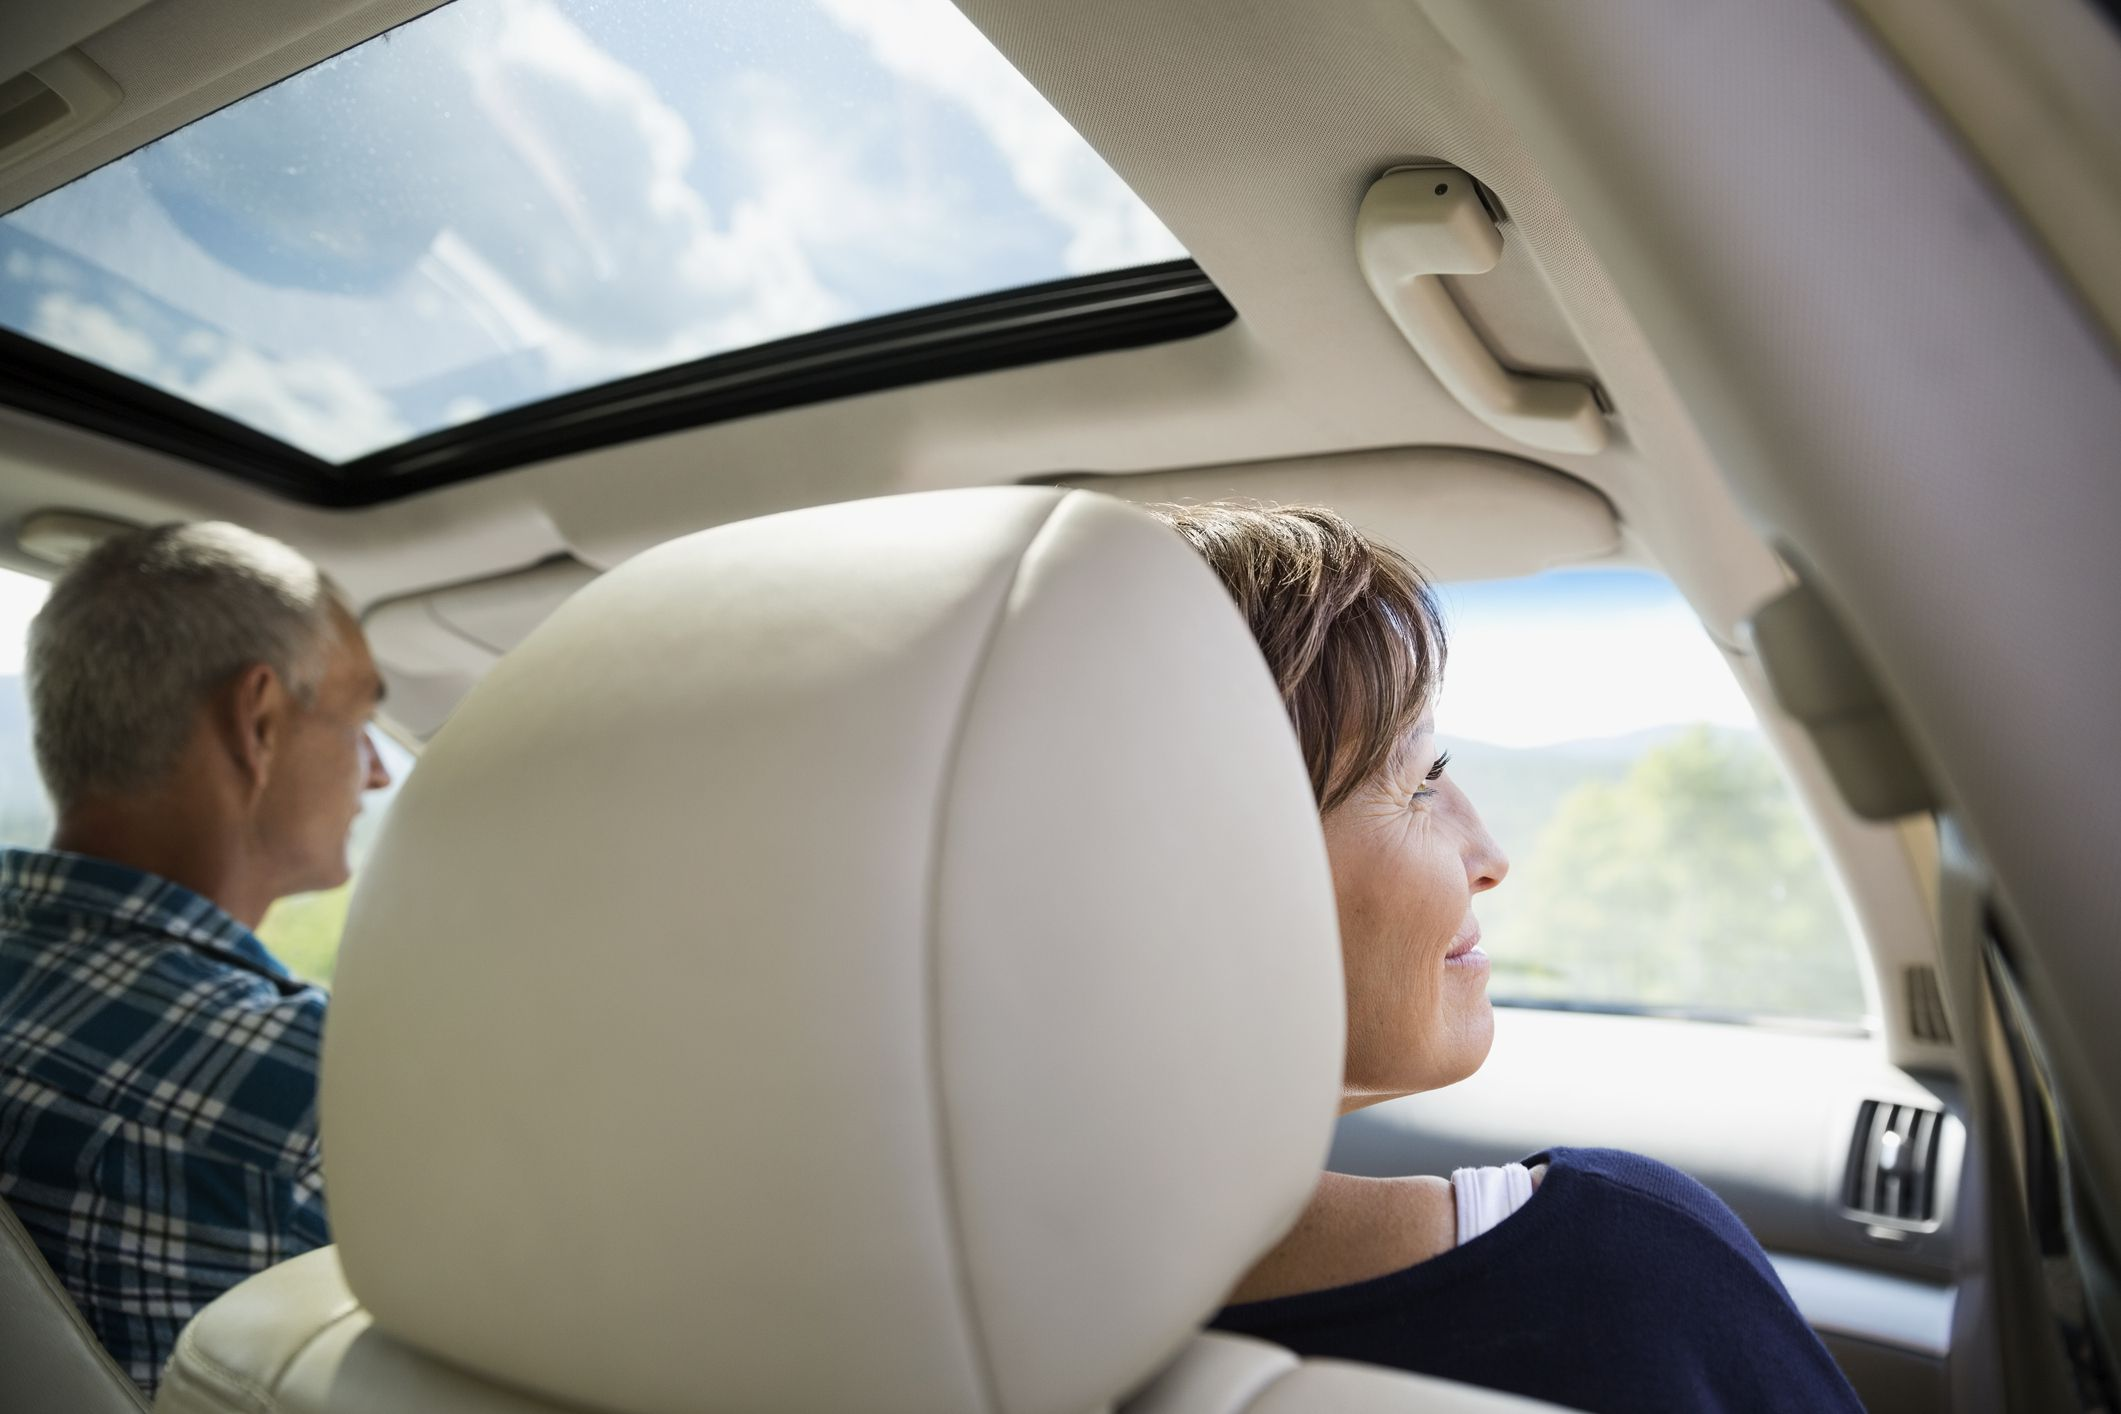 moonroof vs sunroof in vehicles. Black Bedroom Furniture Sets. Home Design Ideas